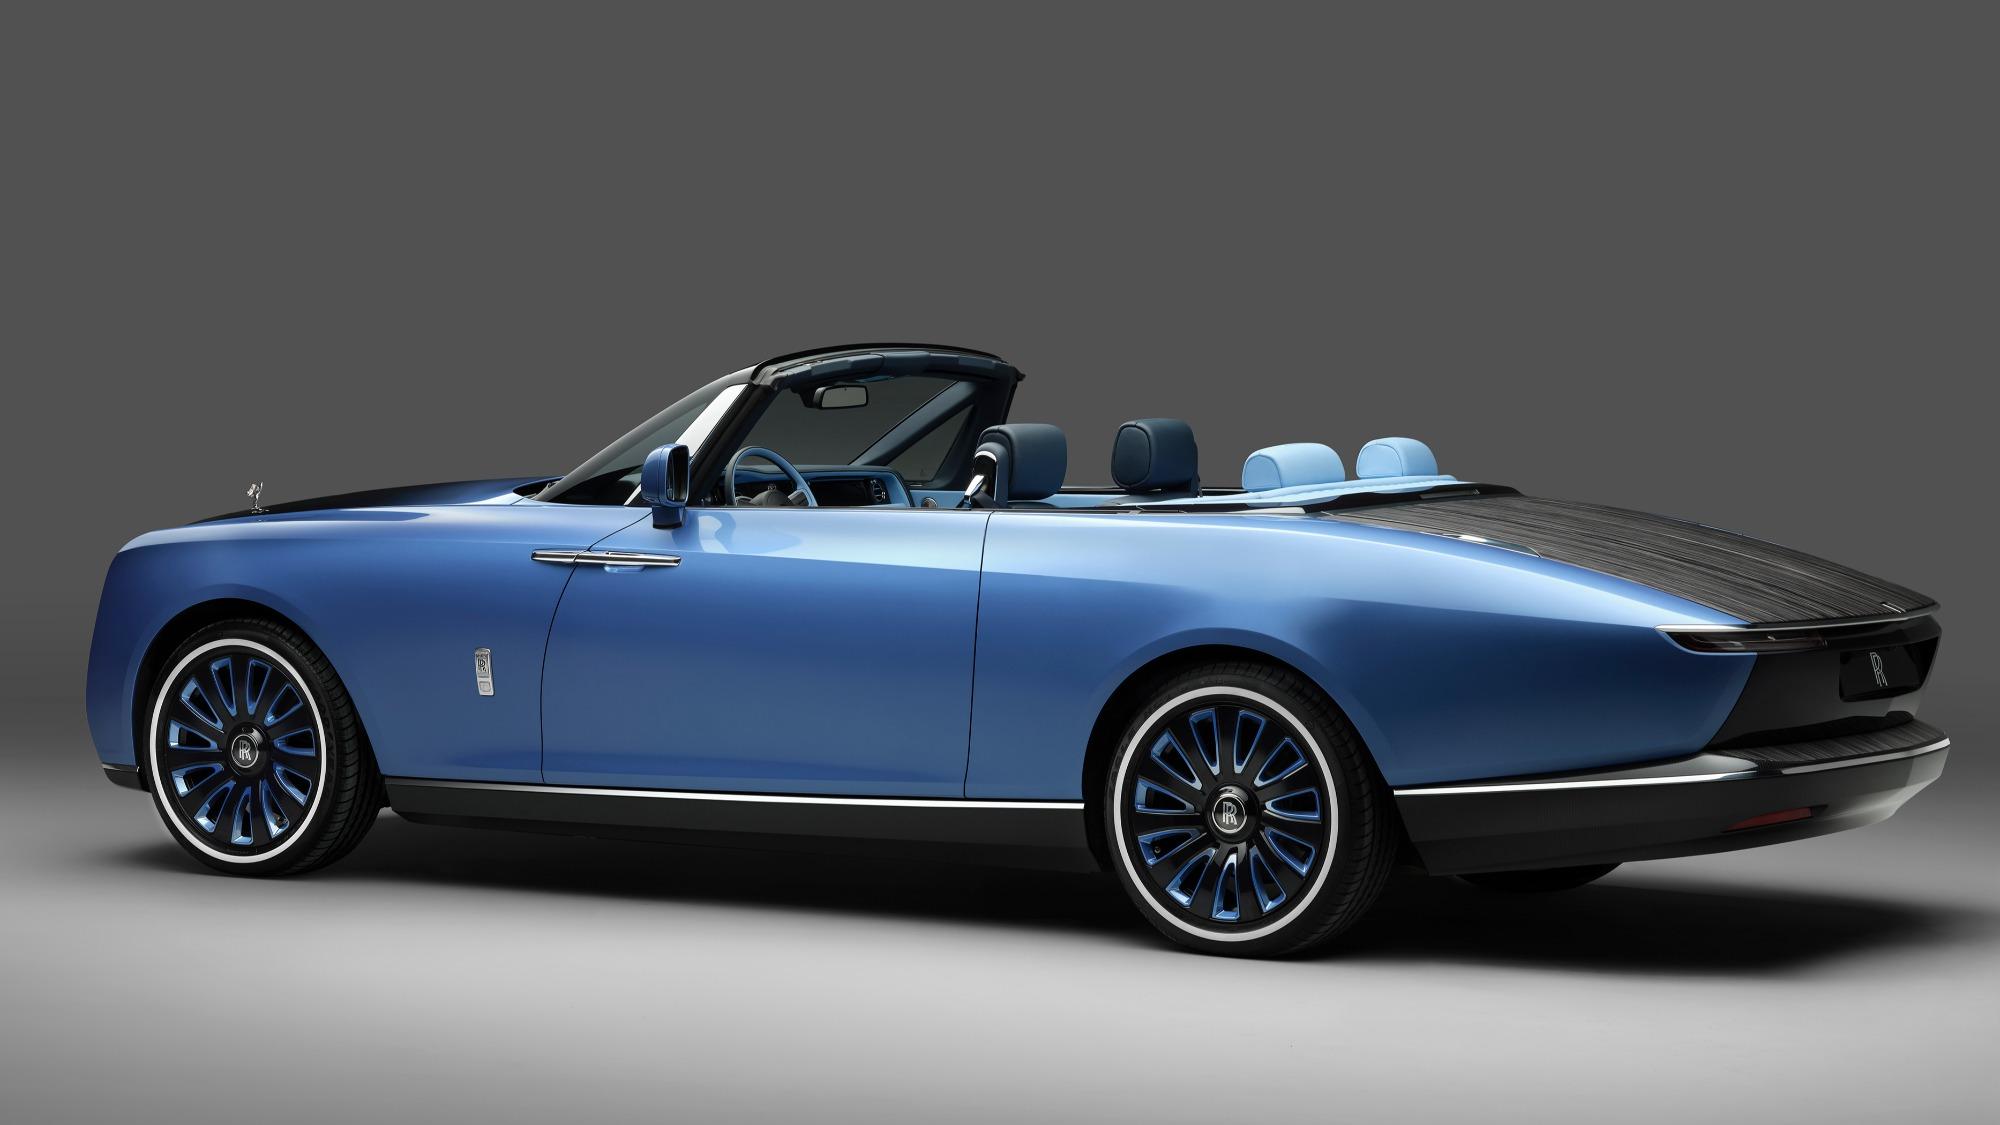 Rolls-Royce Boat Tail conversível azul visto 3/4 de trás